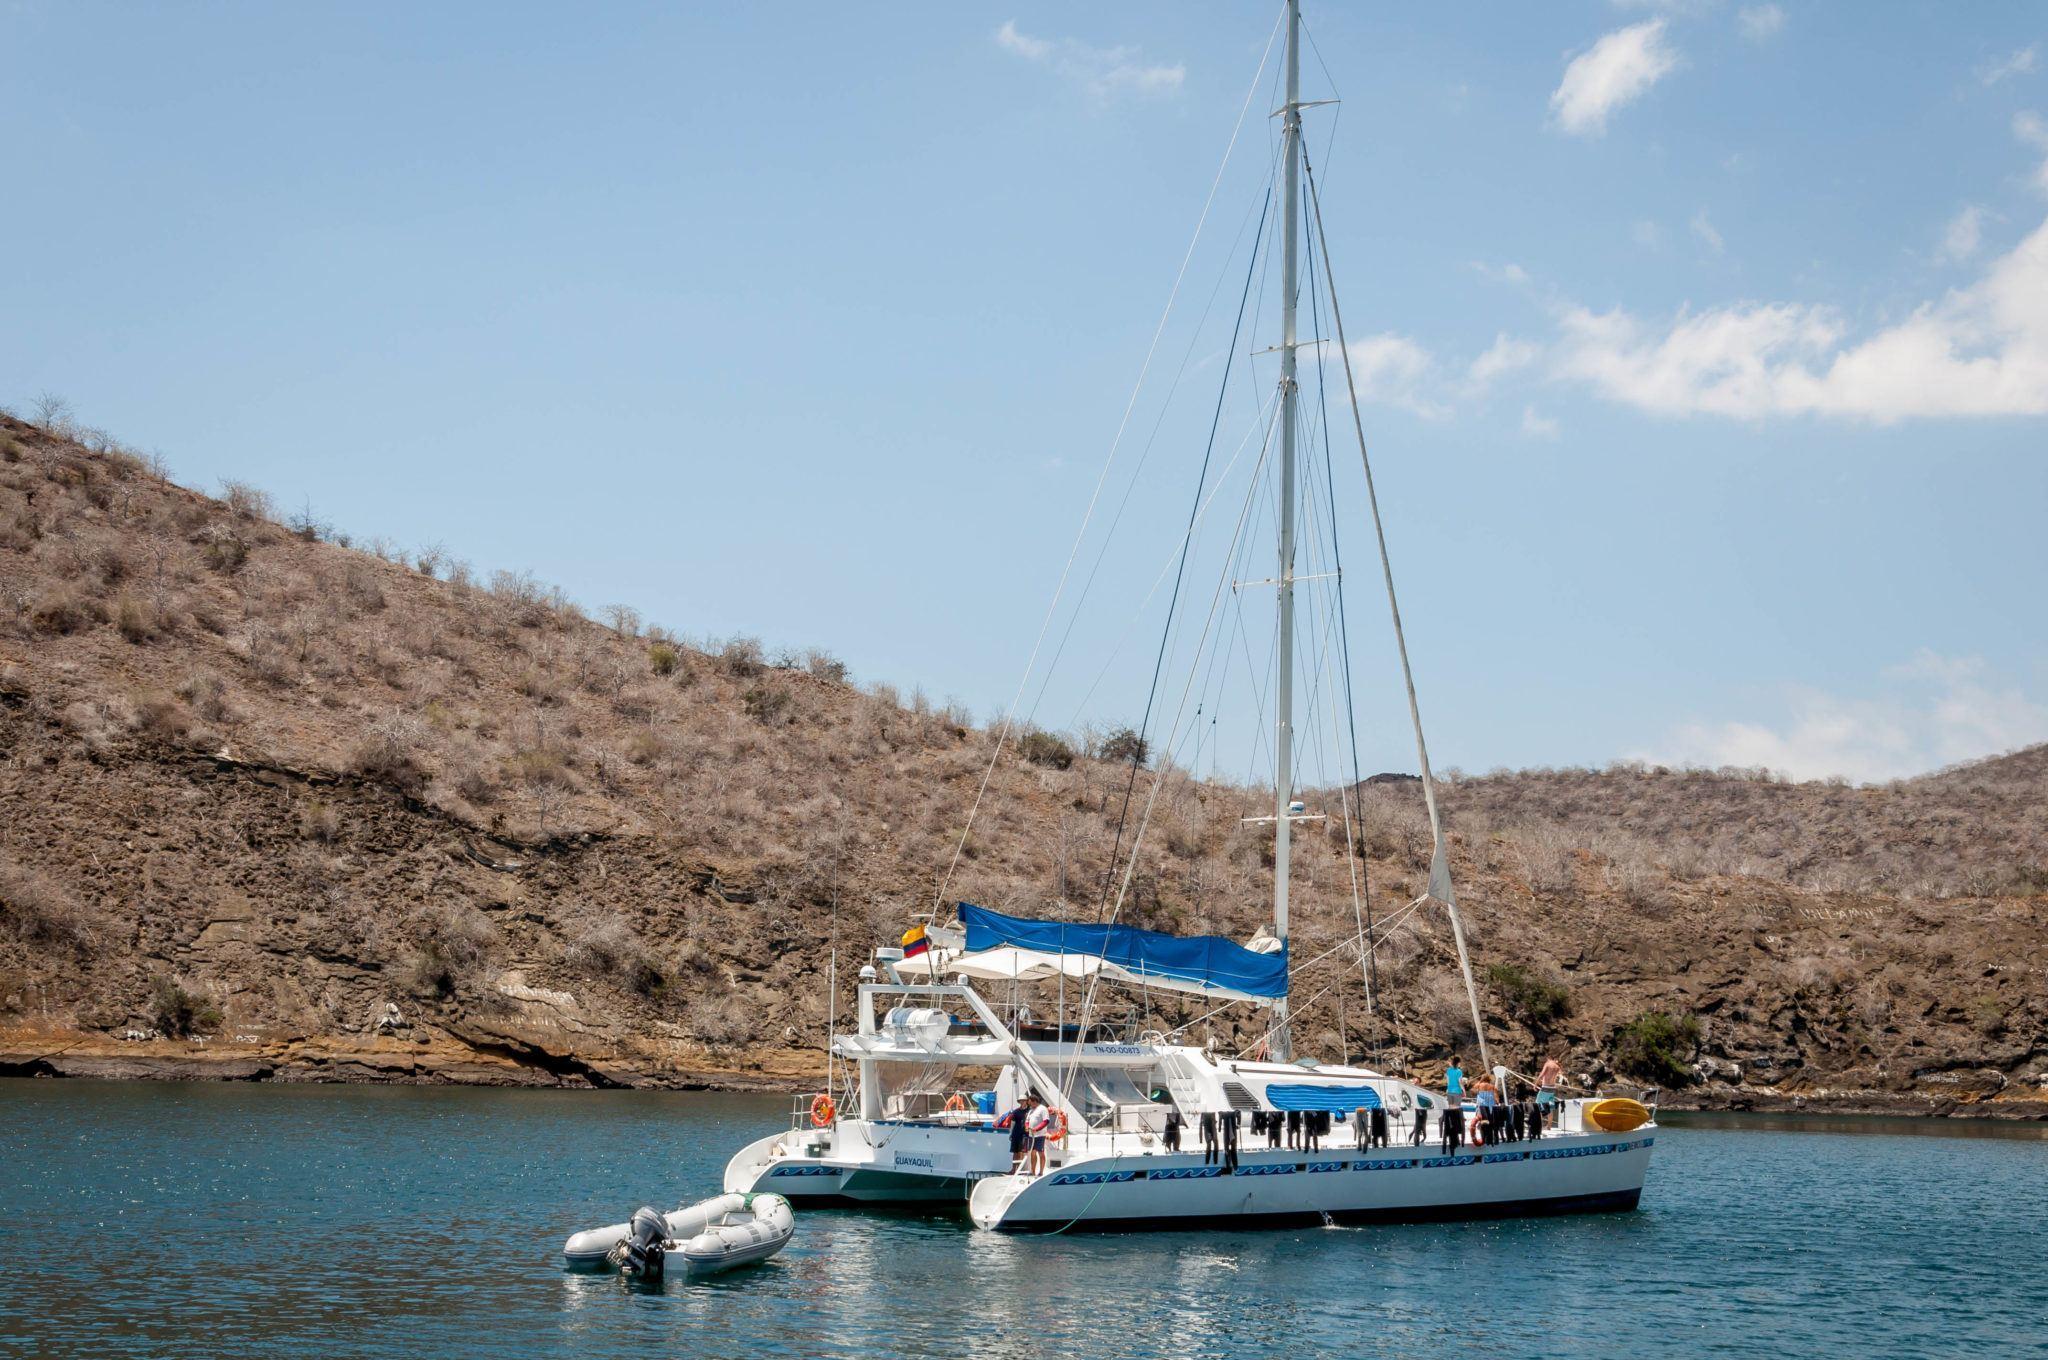 A catamaran boat in the Galapagos